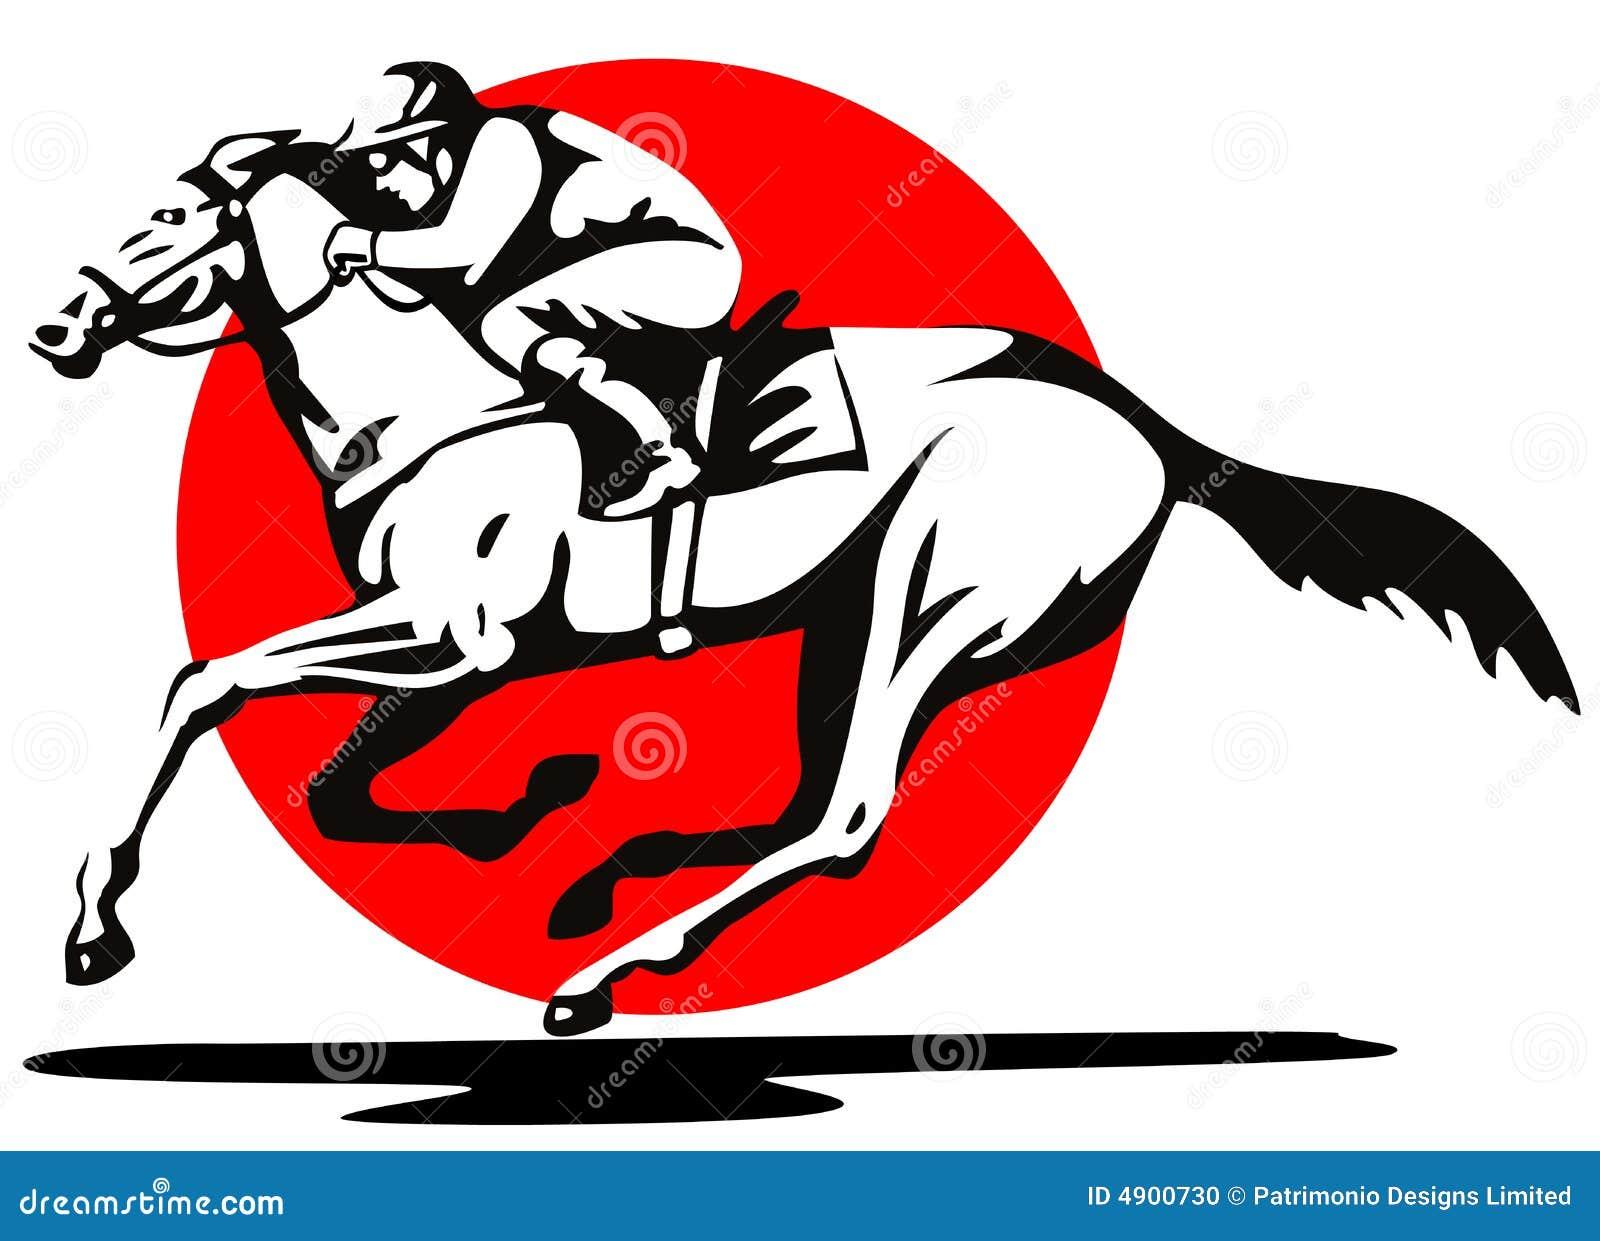 Horse Racing Clip Art Horse racing